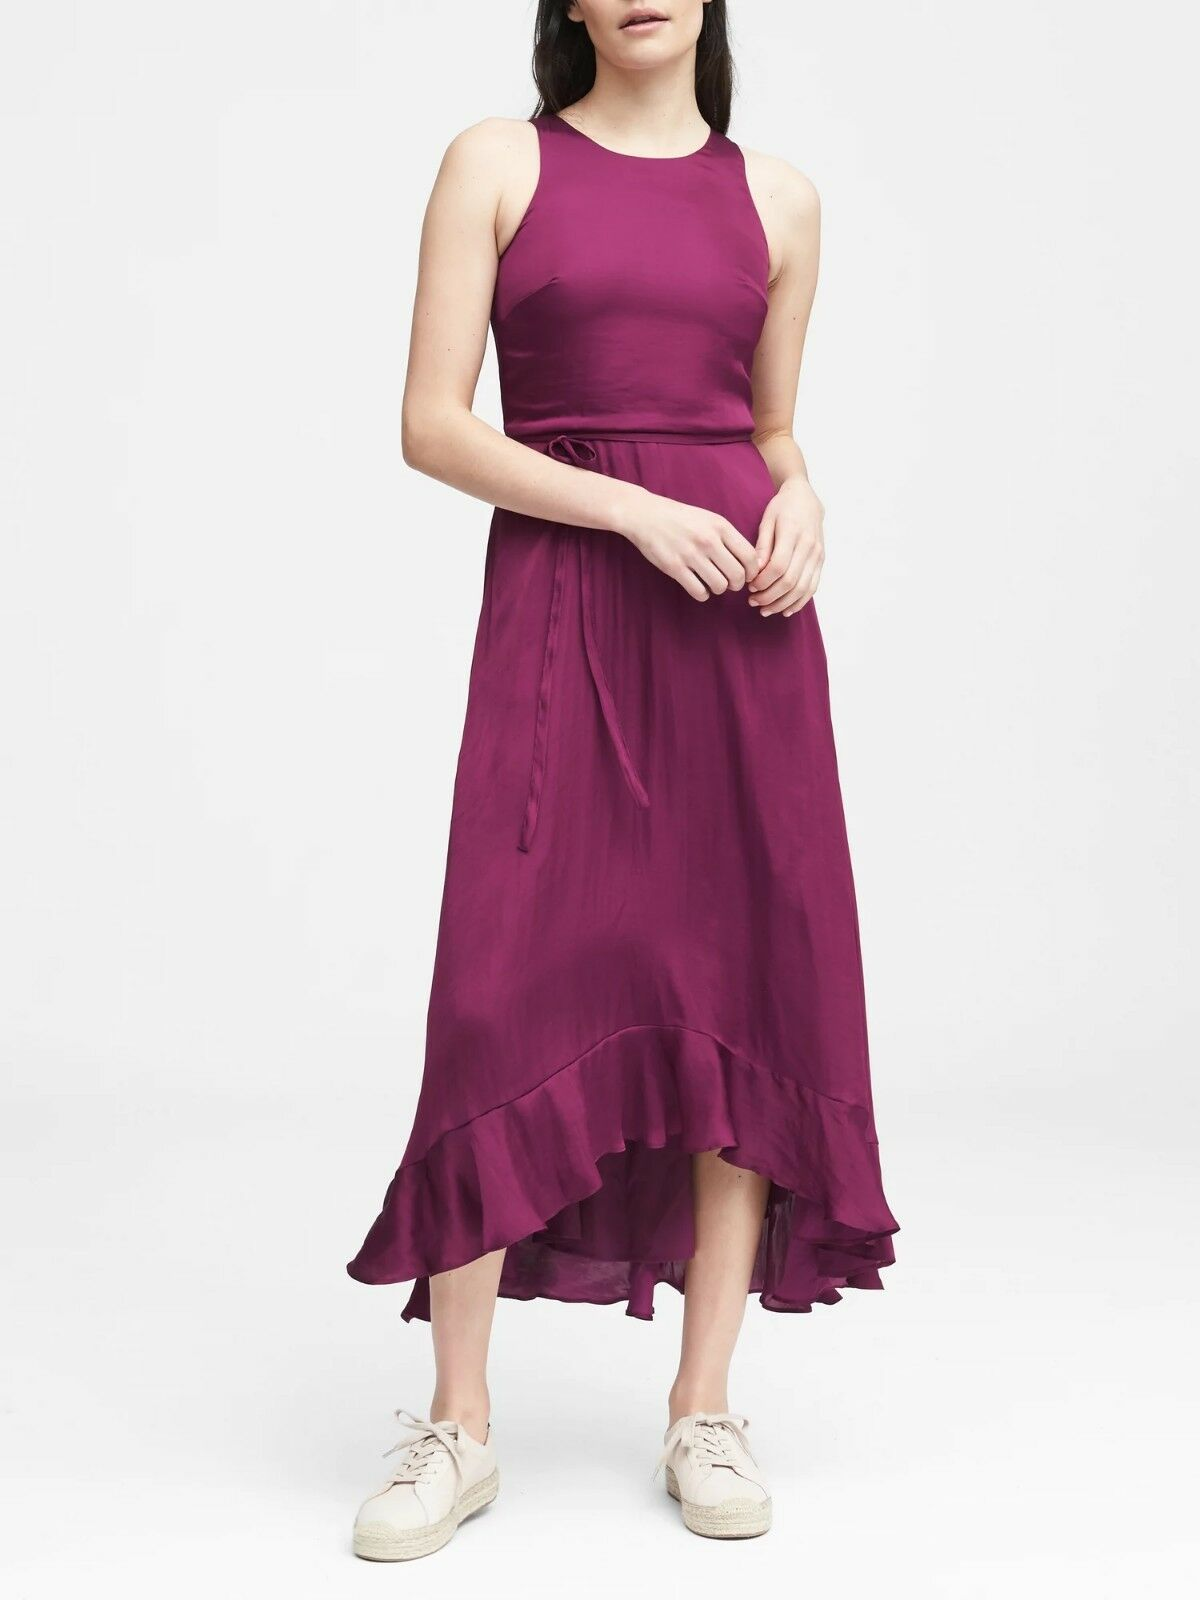 NWT Banana Fit-and-Flare Maxi Dress, Raspberry Größe 2P 2 P          E44